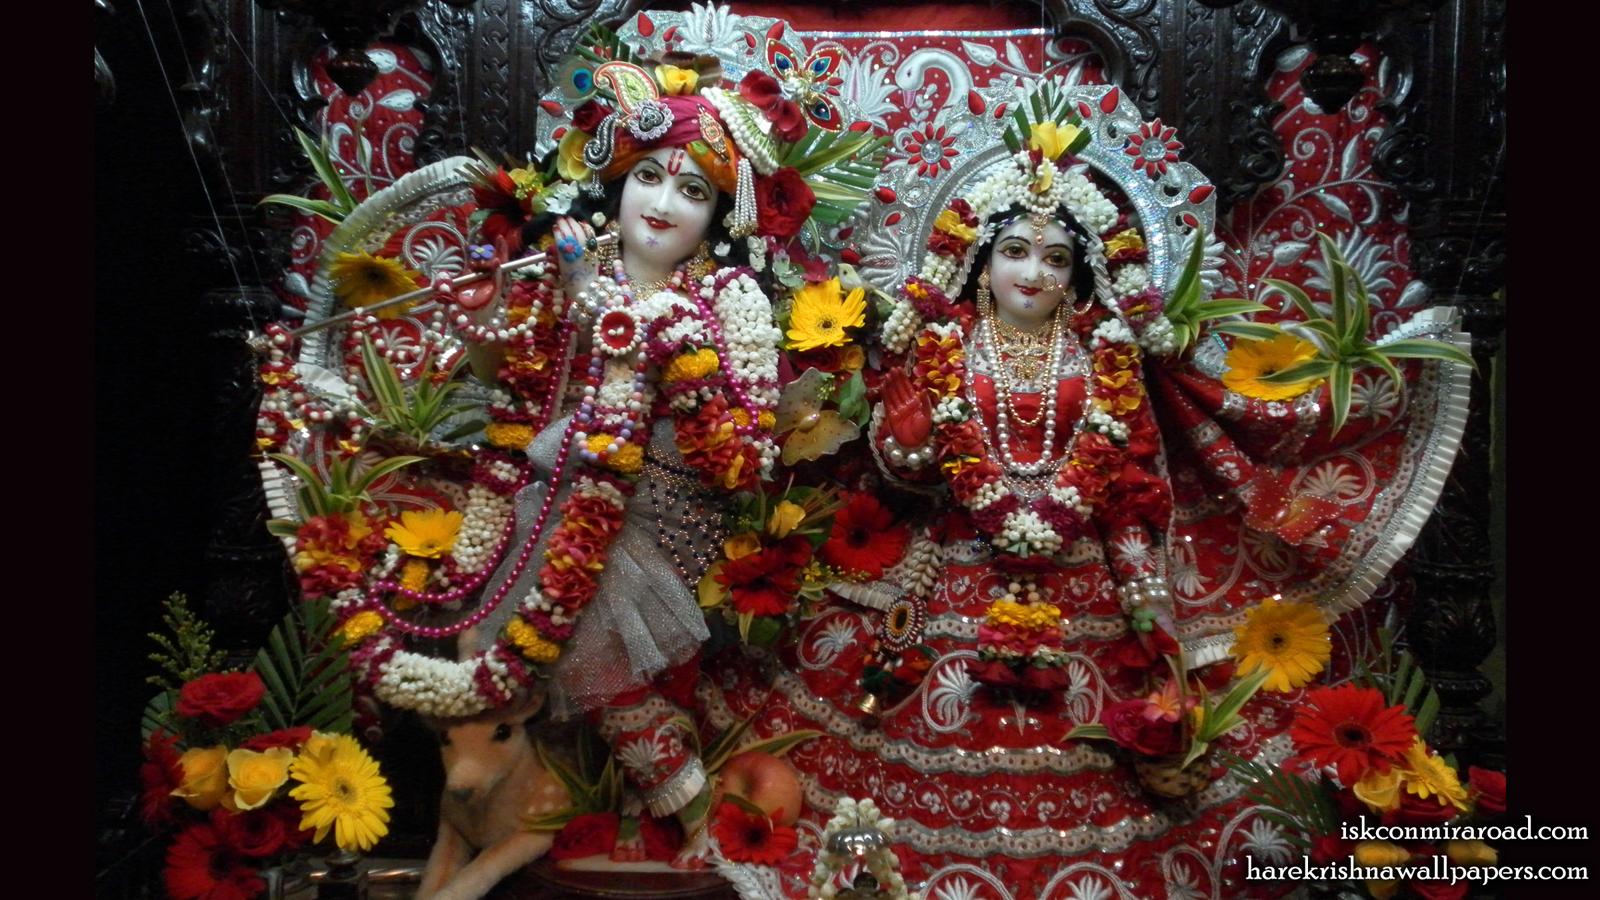 Sri Sri Radha Giridhari Wallpaper (006) Size 1600x900 Download